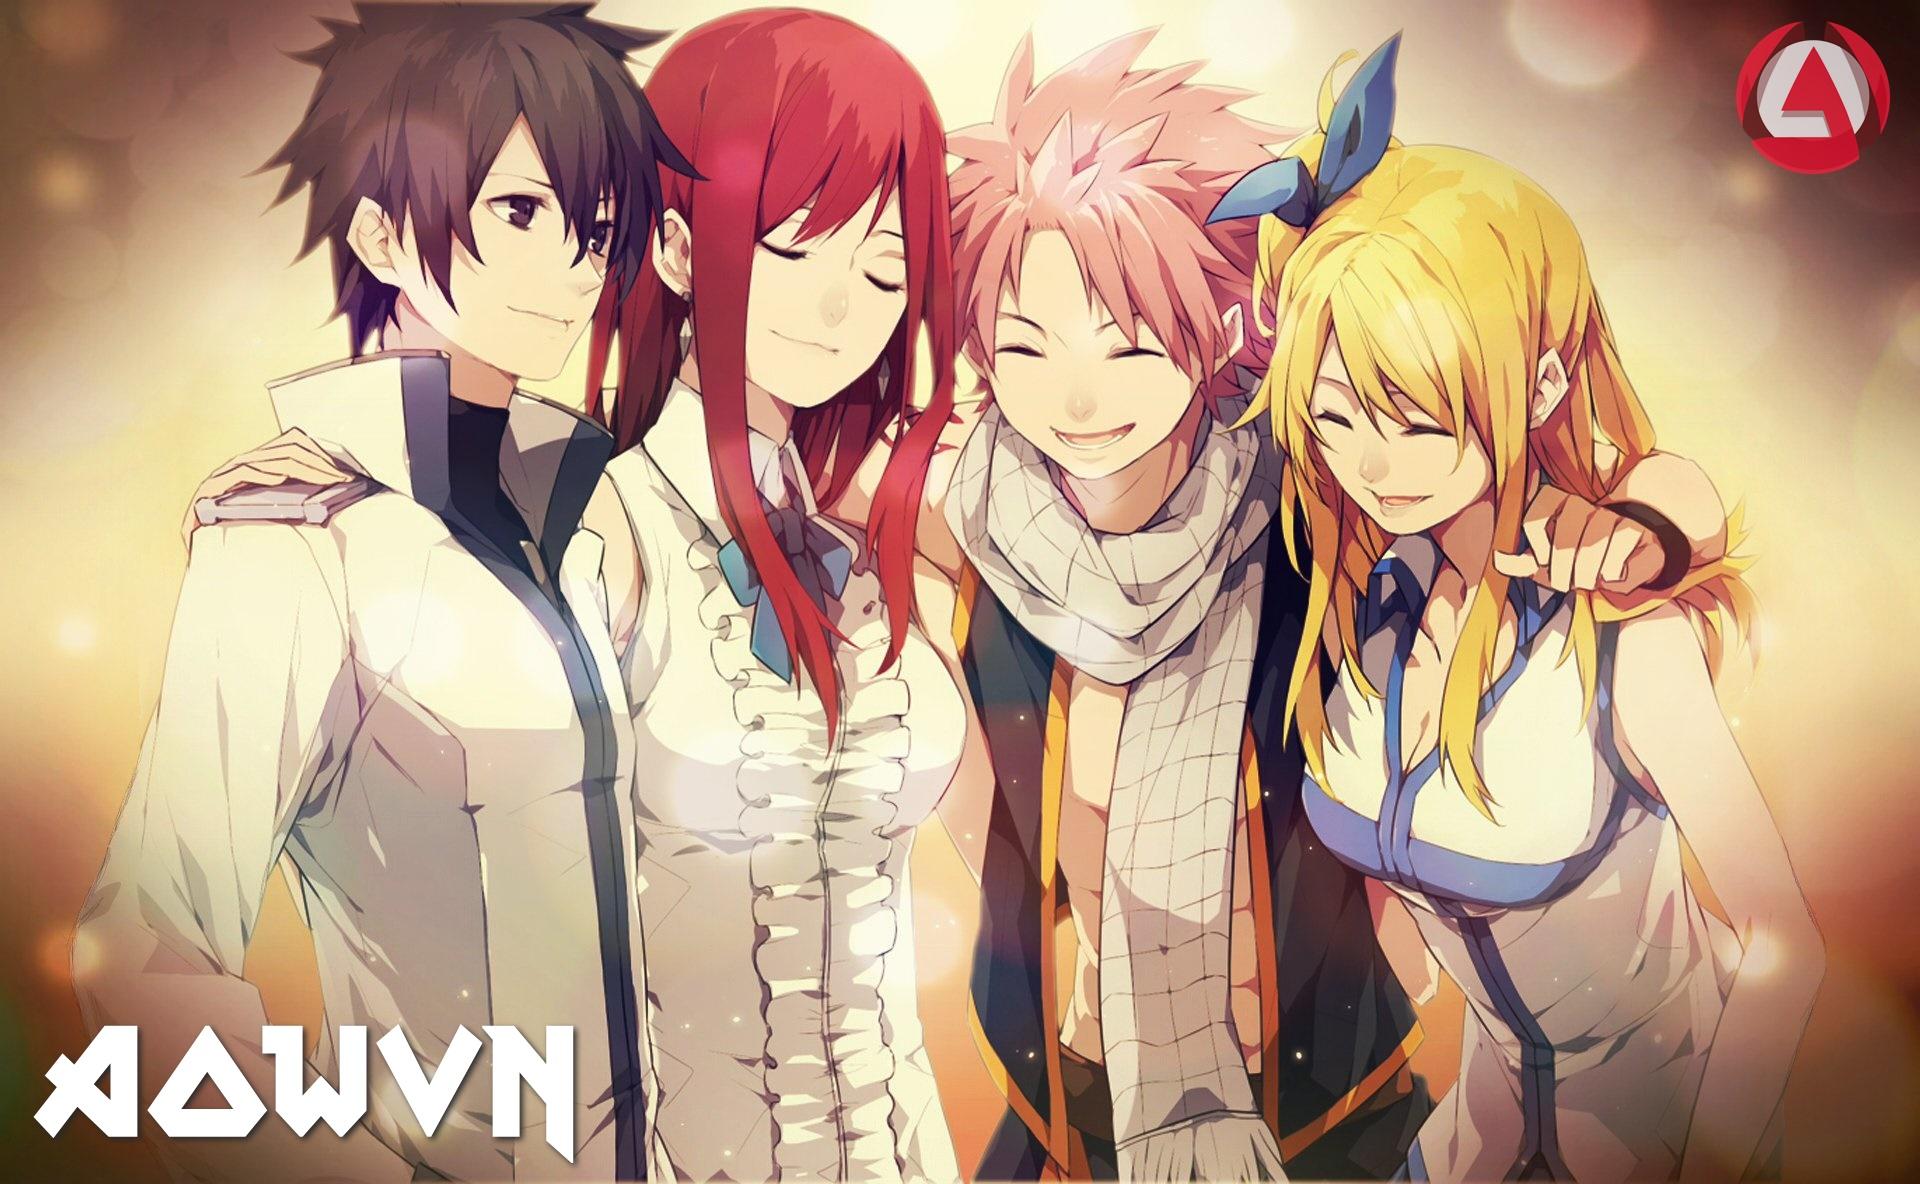 thumb 1920 311015 - [ Anime 3gp Mp4 ] Fairy Tail | Vietsub - Cực hay